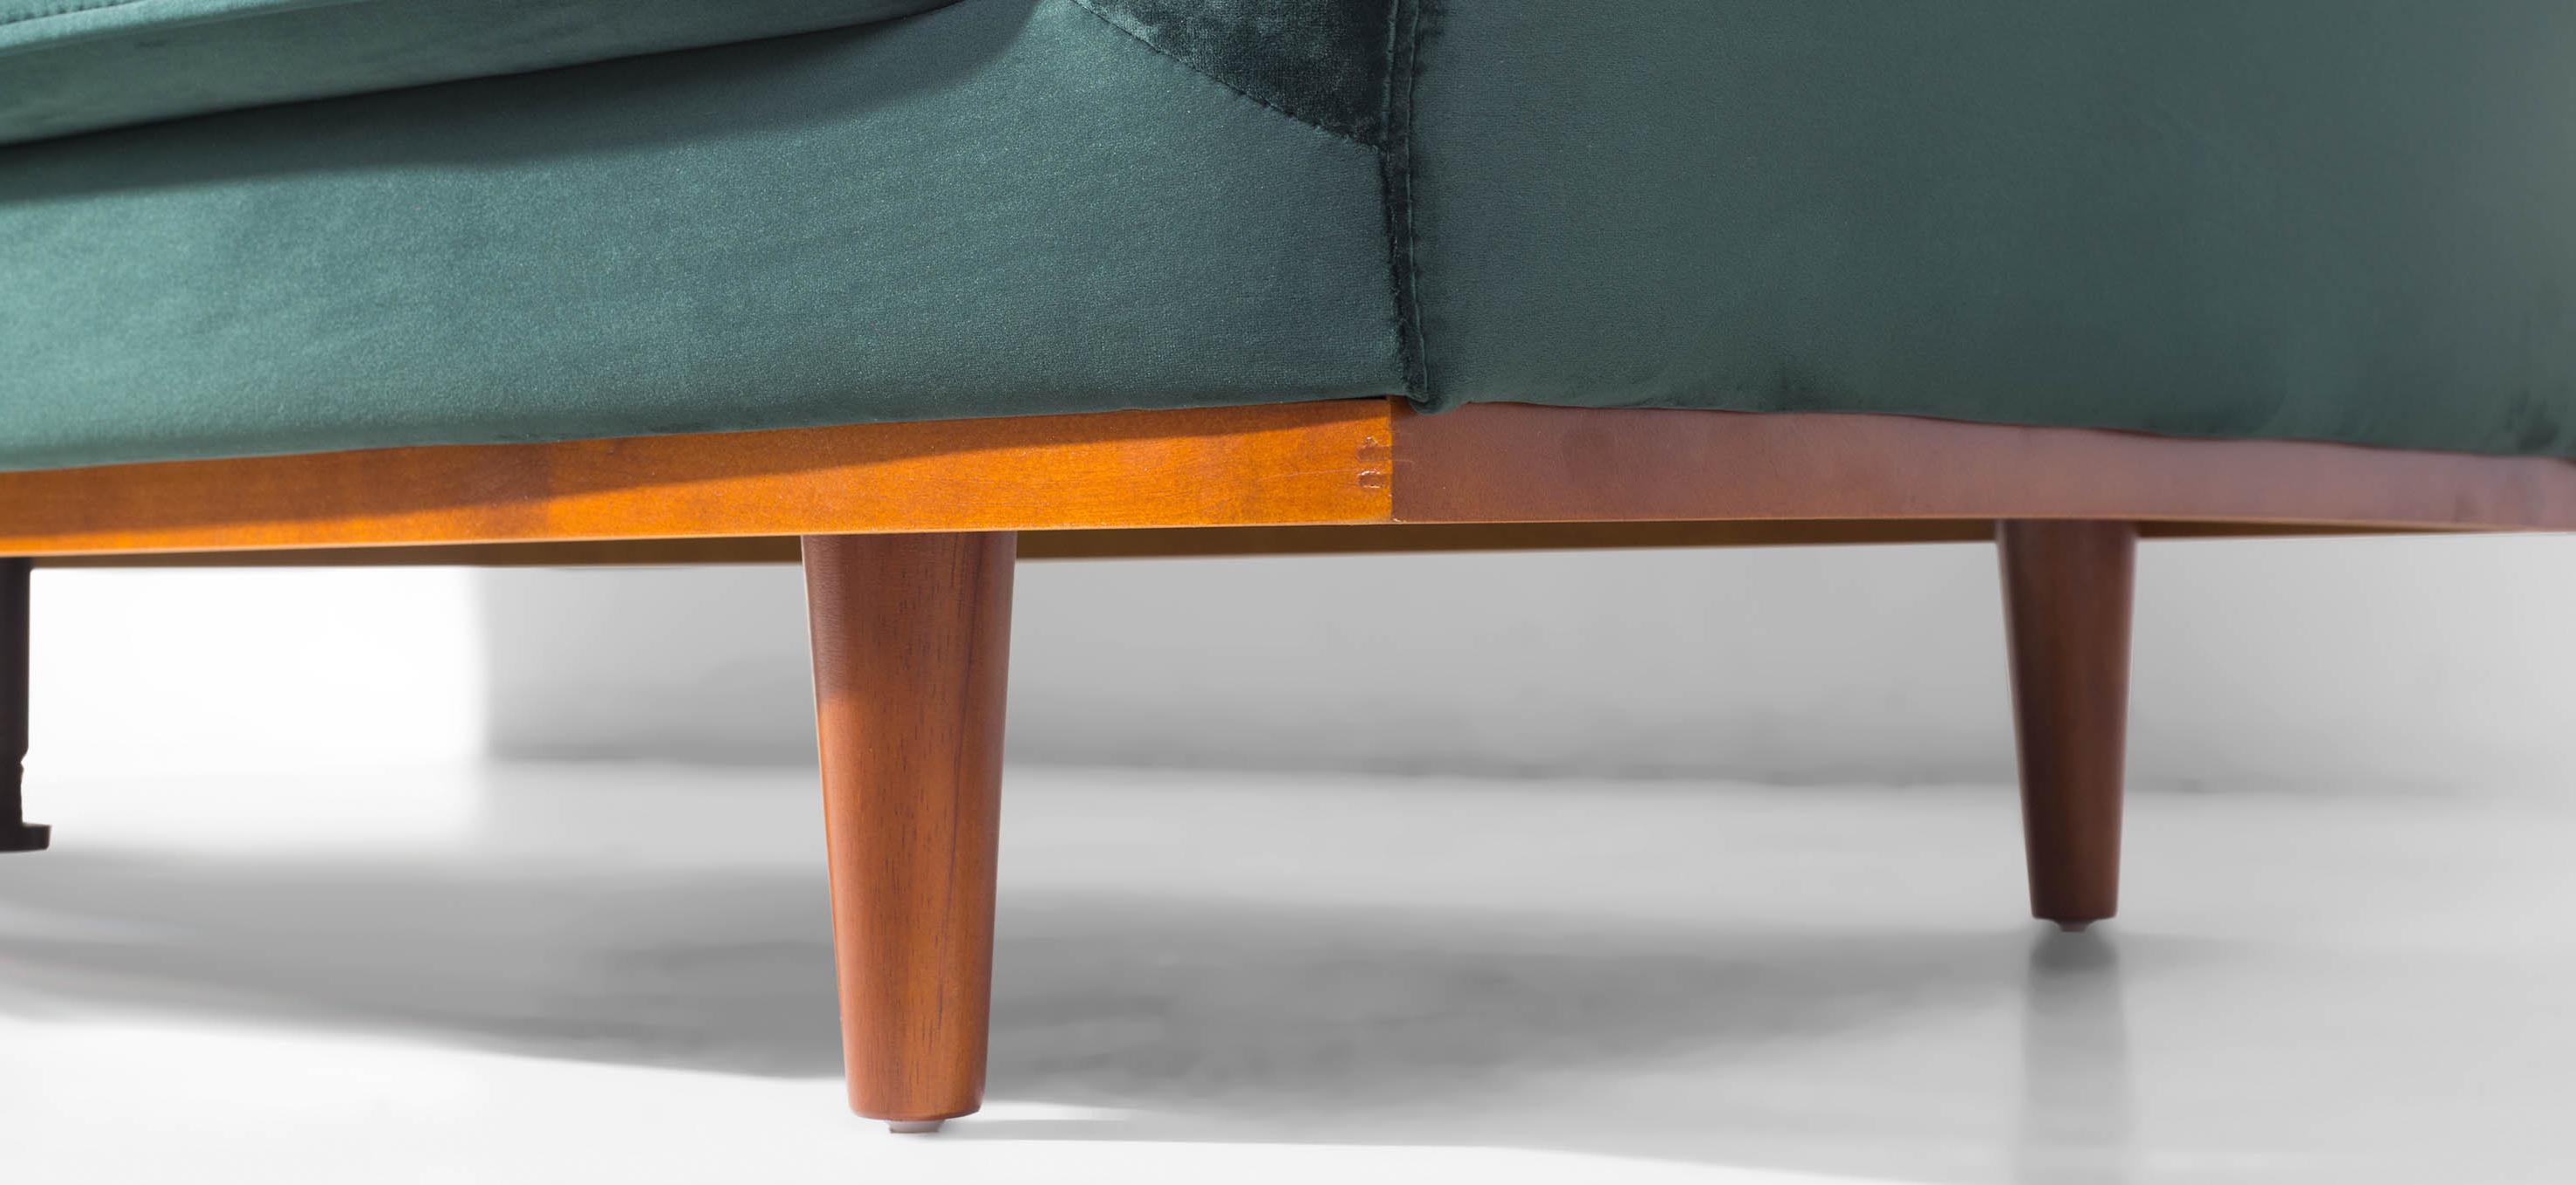 Freida 3 Seater Sofa (Emerald Green) Regarding Newest Frida 3 Piece Dining Table Sets (View 25 of 25)